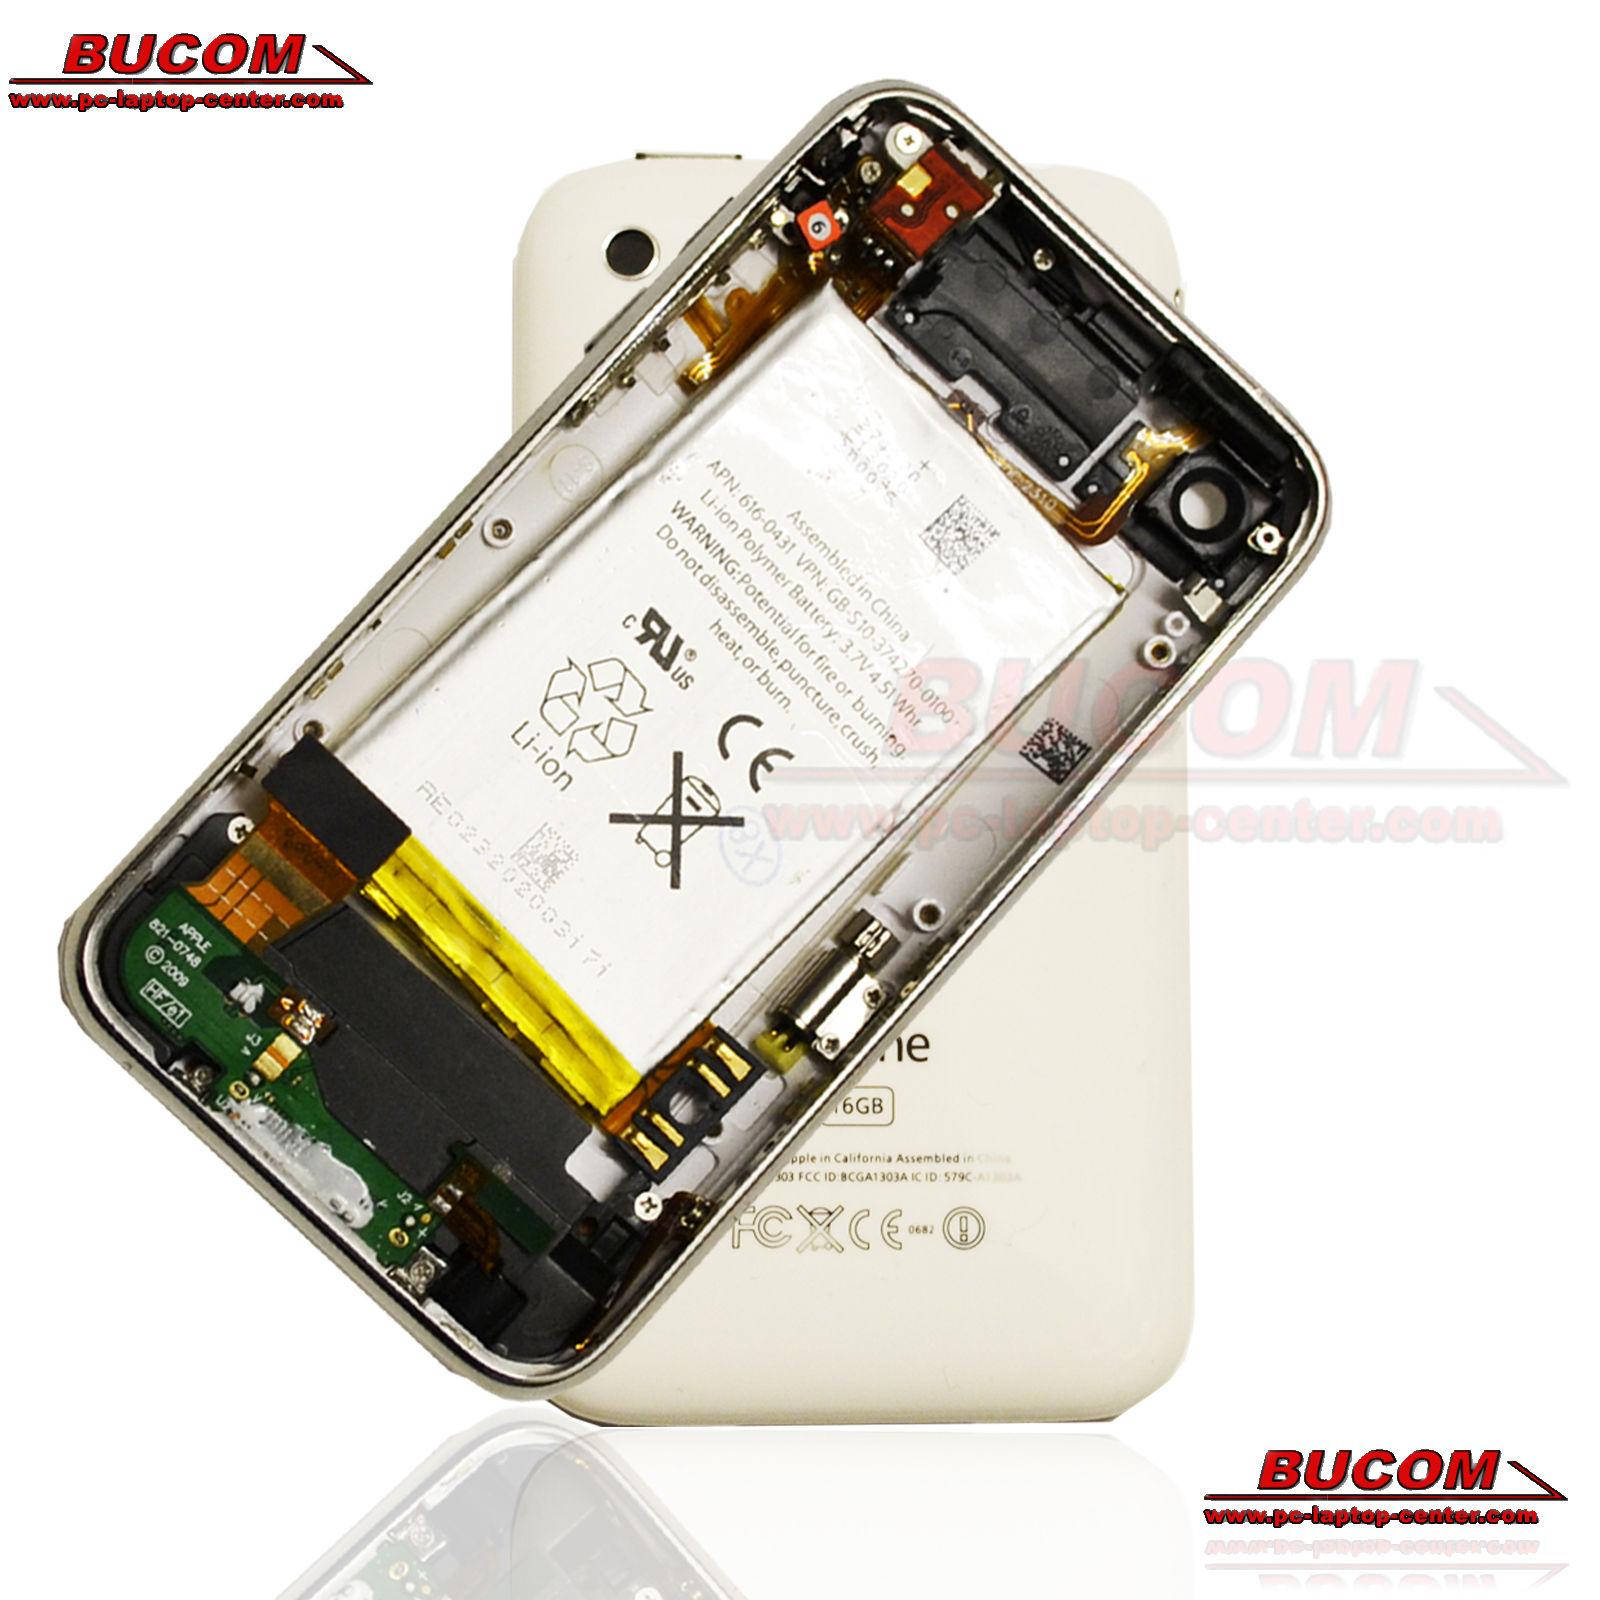 PC-LAPTOP-CENTER.COM - Apple iPhone 4 Display Digitizer Touchsreen ...